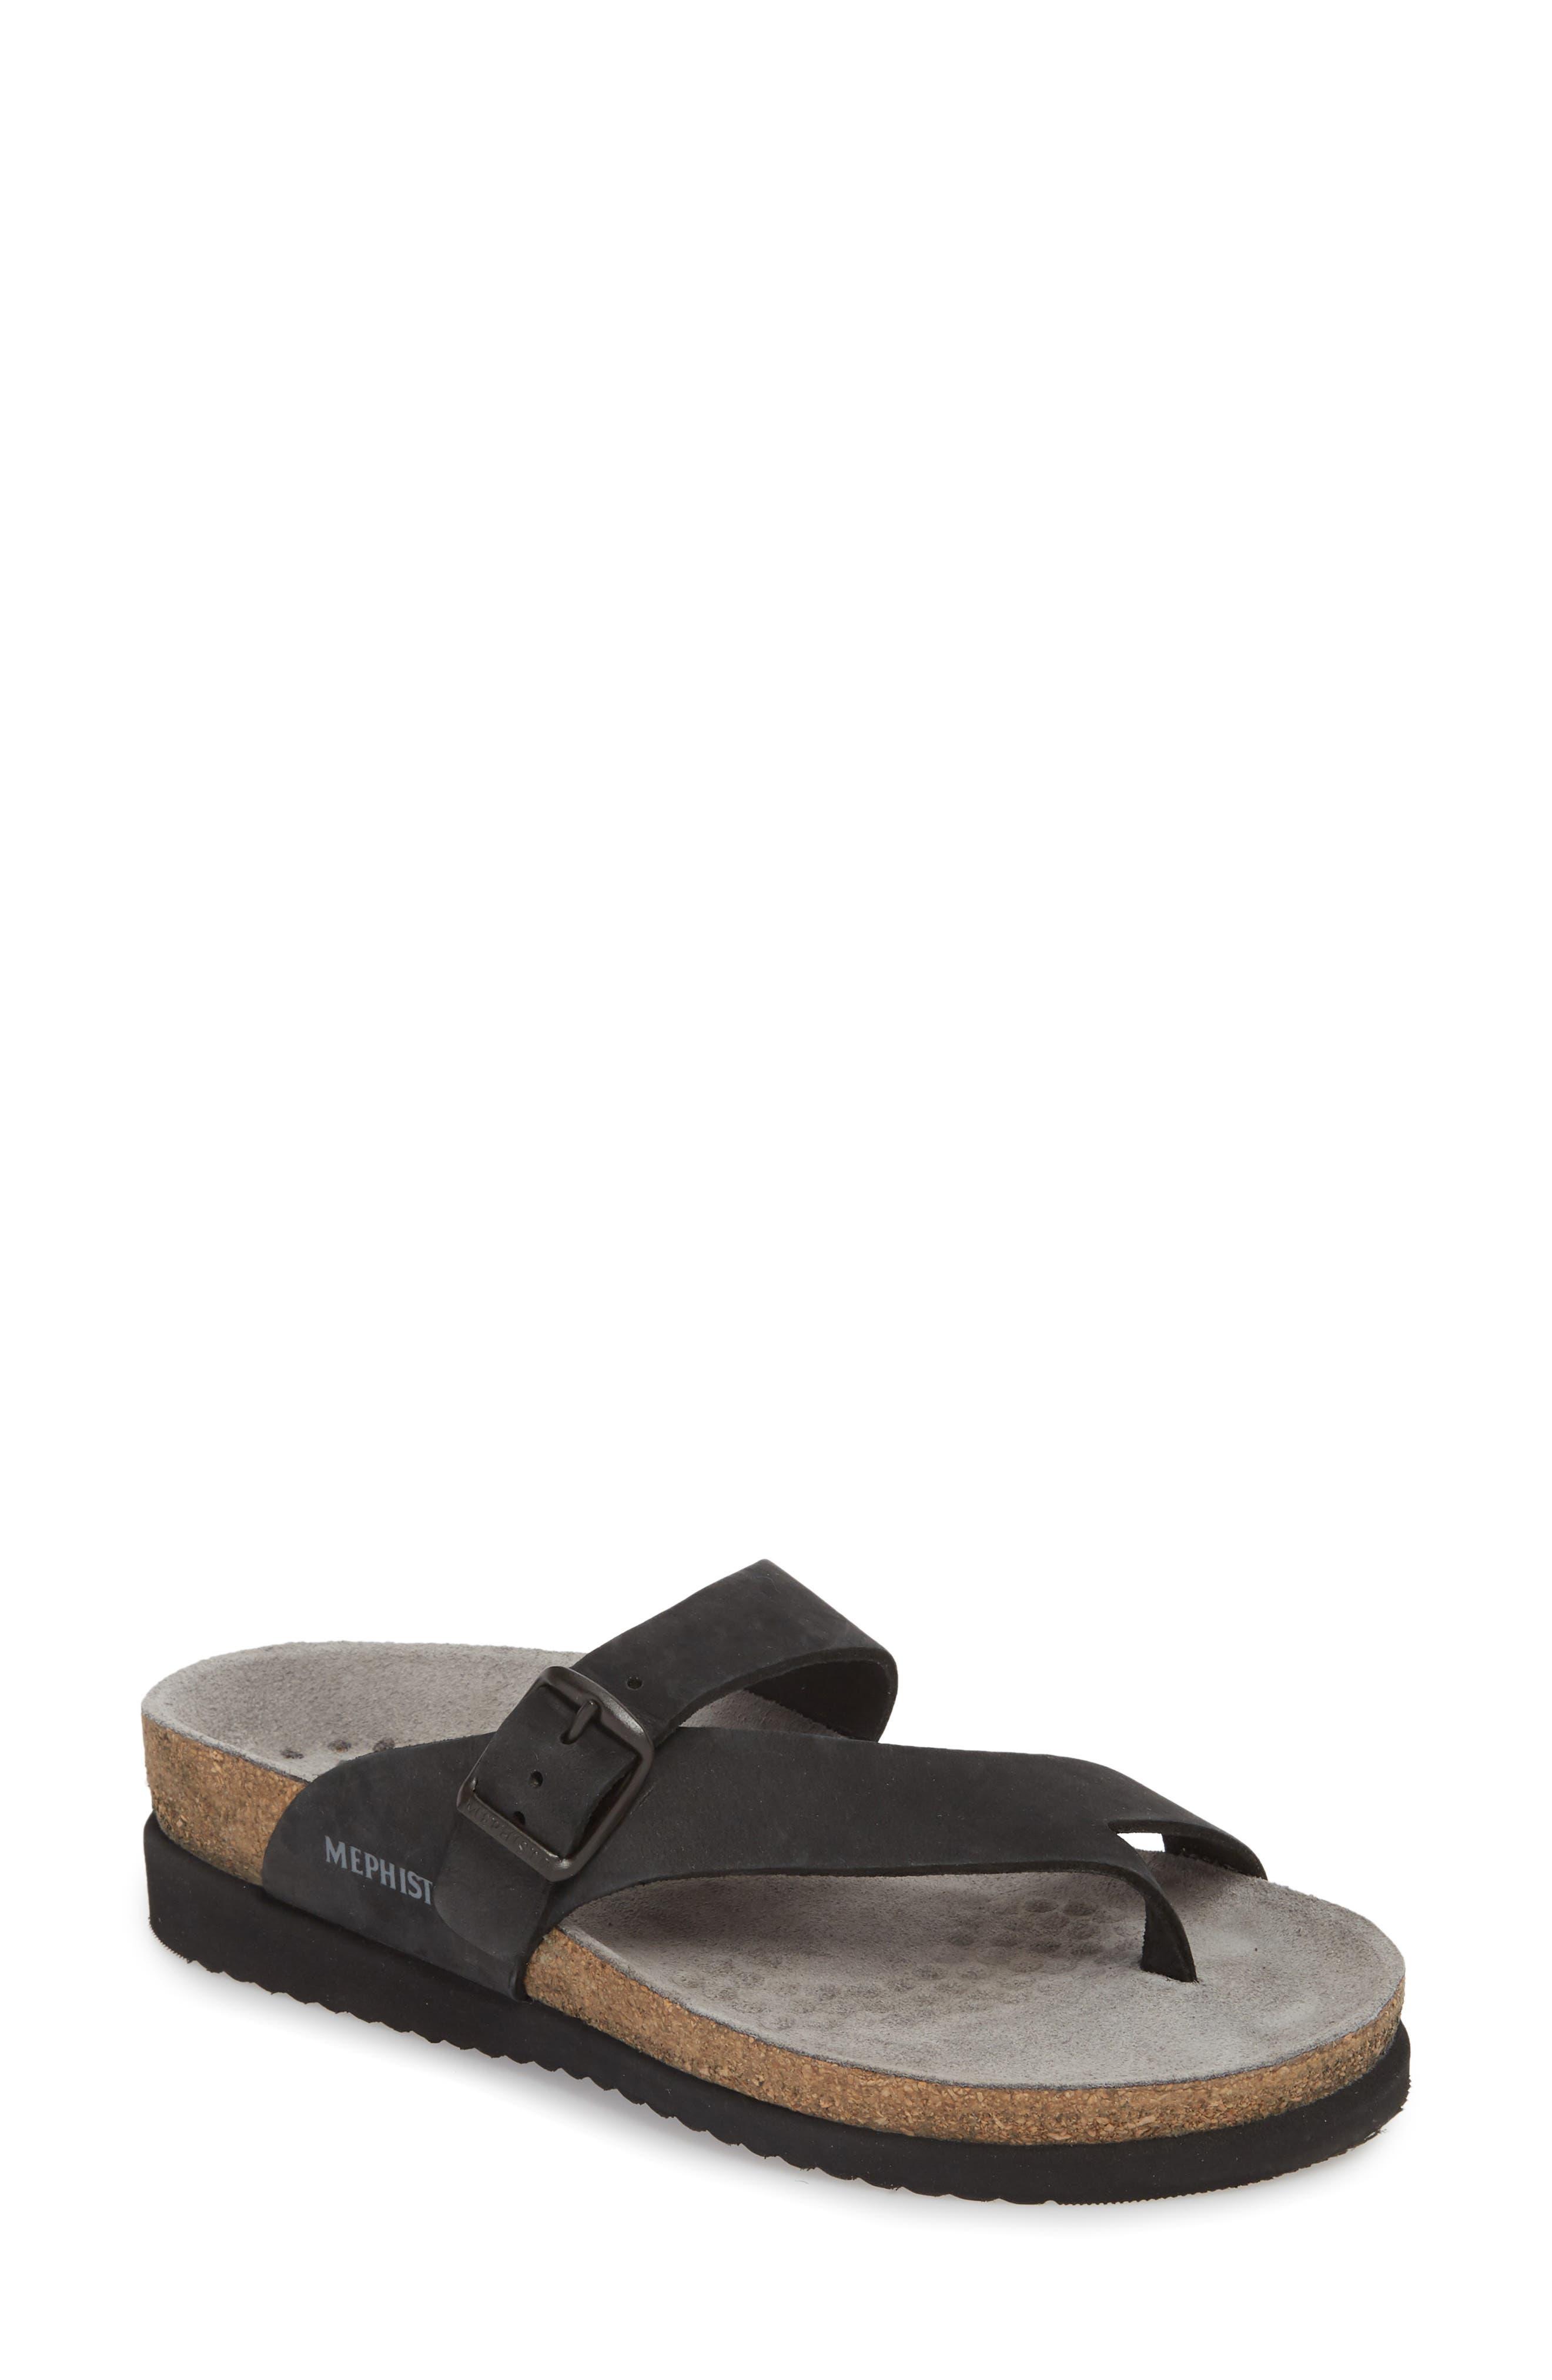 MEPHISTO 'Helen' Sandal, Main, color, BLACK NUBUCK